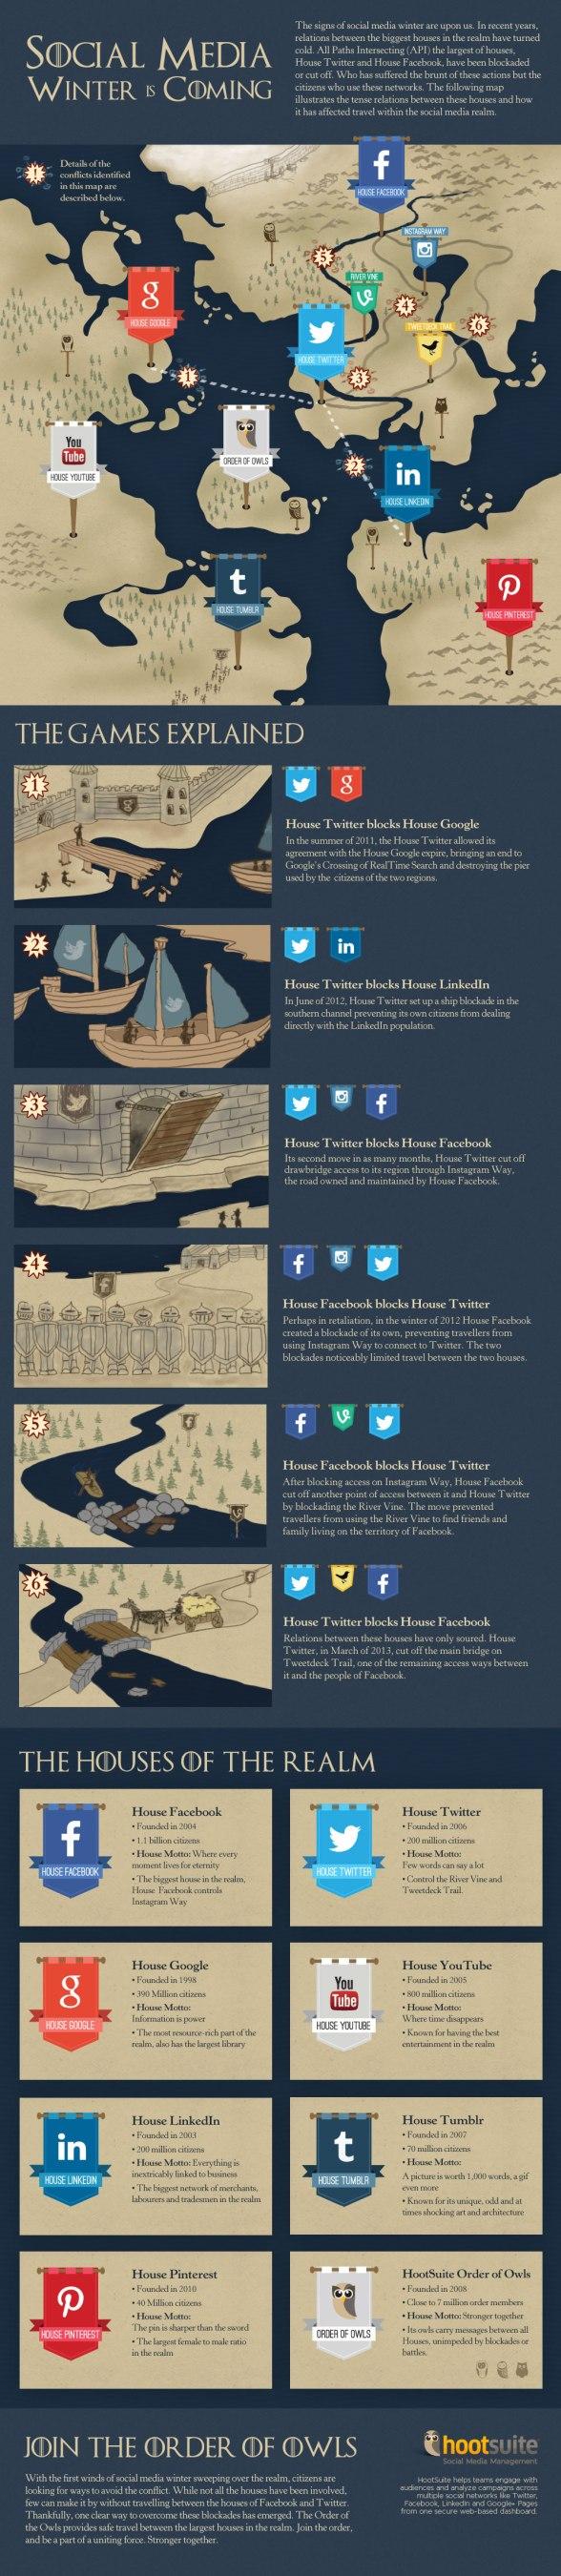 sm_game_of_thrones_infografica1